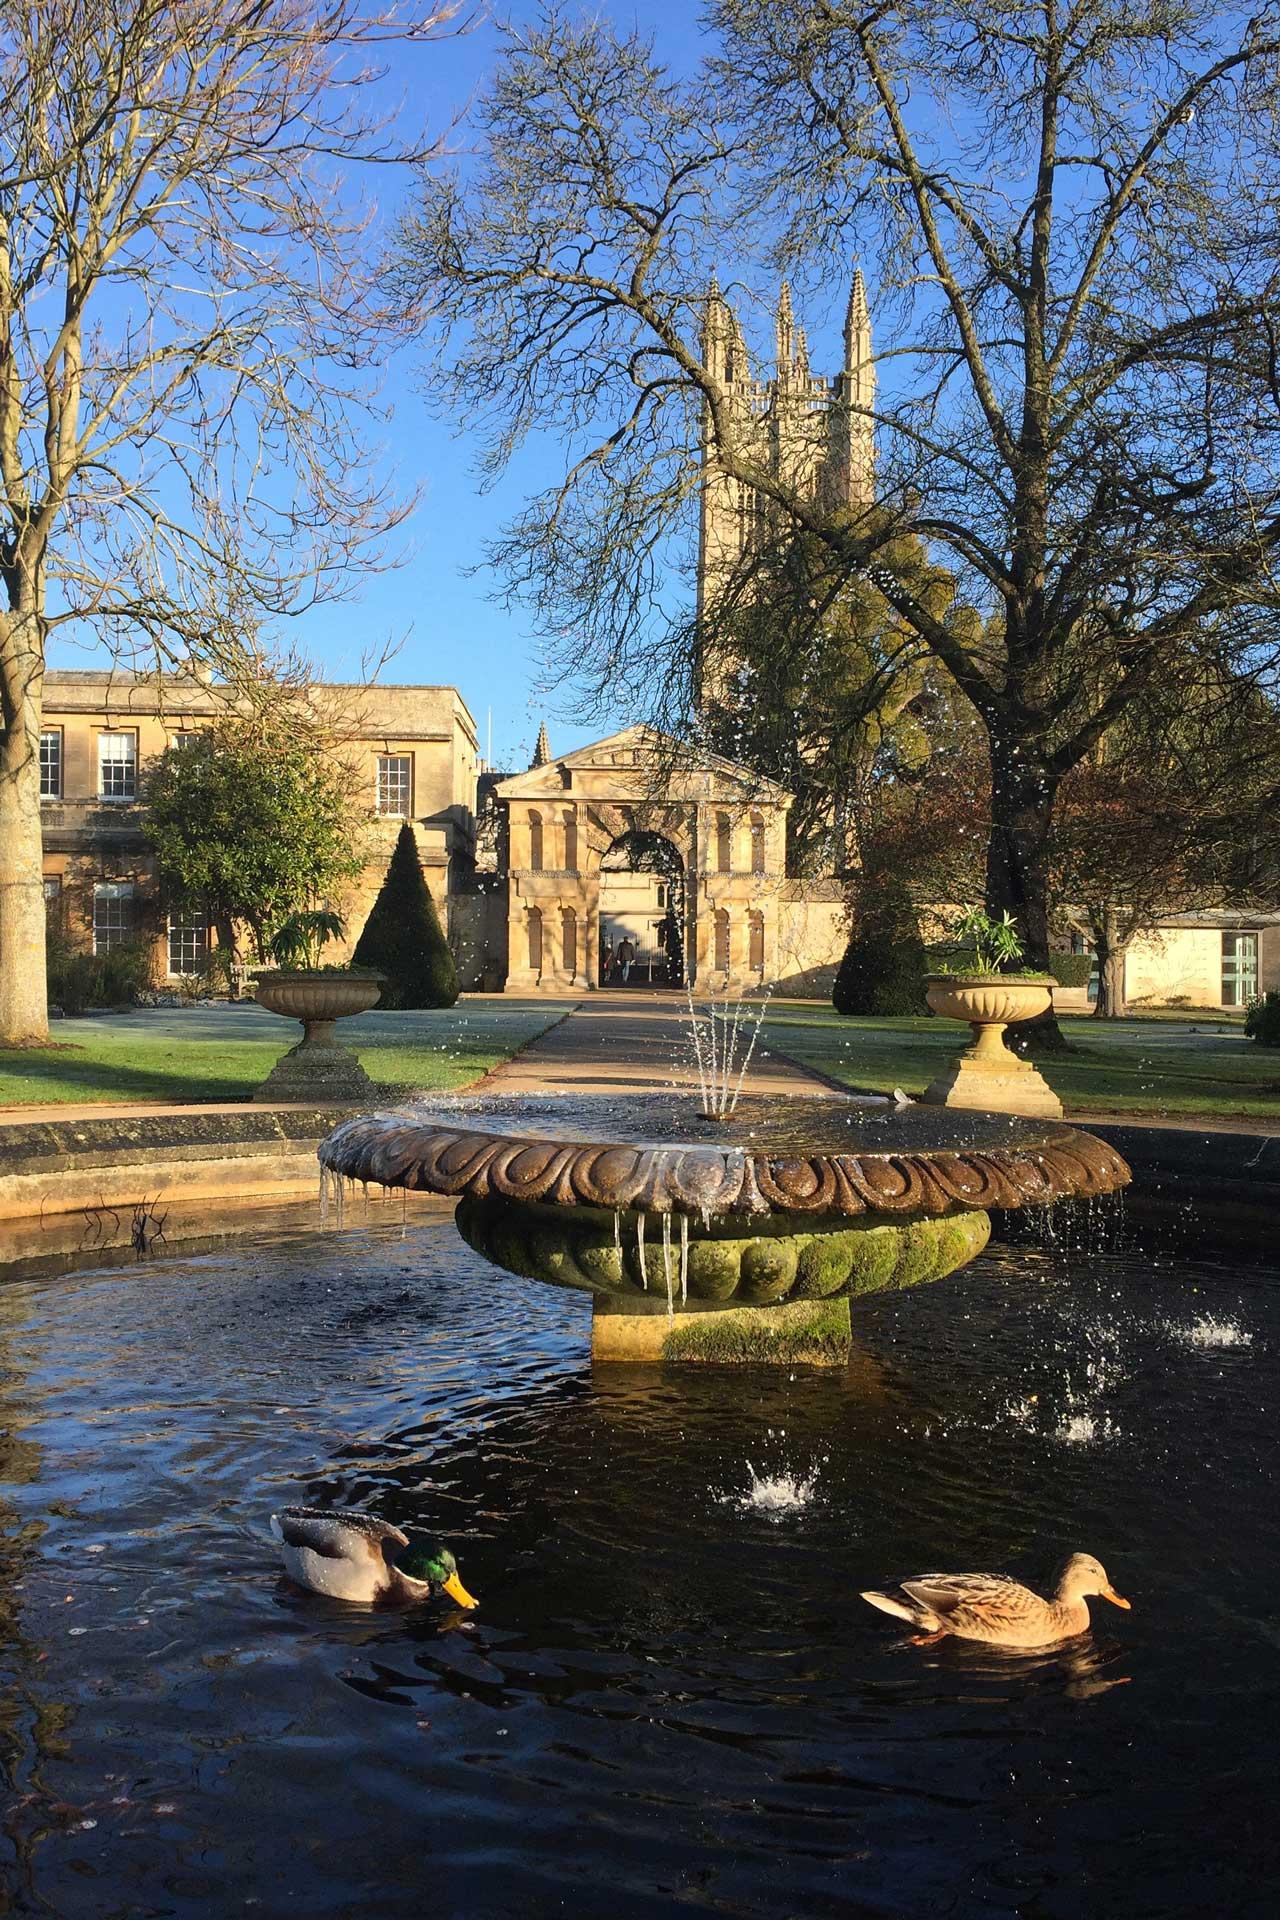 University Of Oxford: The University Of Oxford Botanic Garden